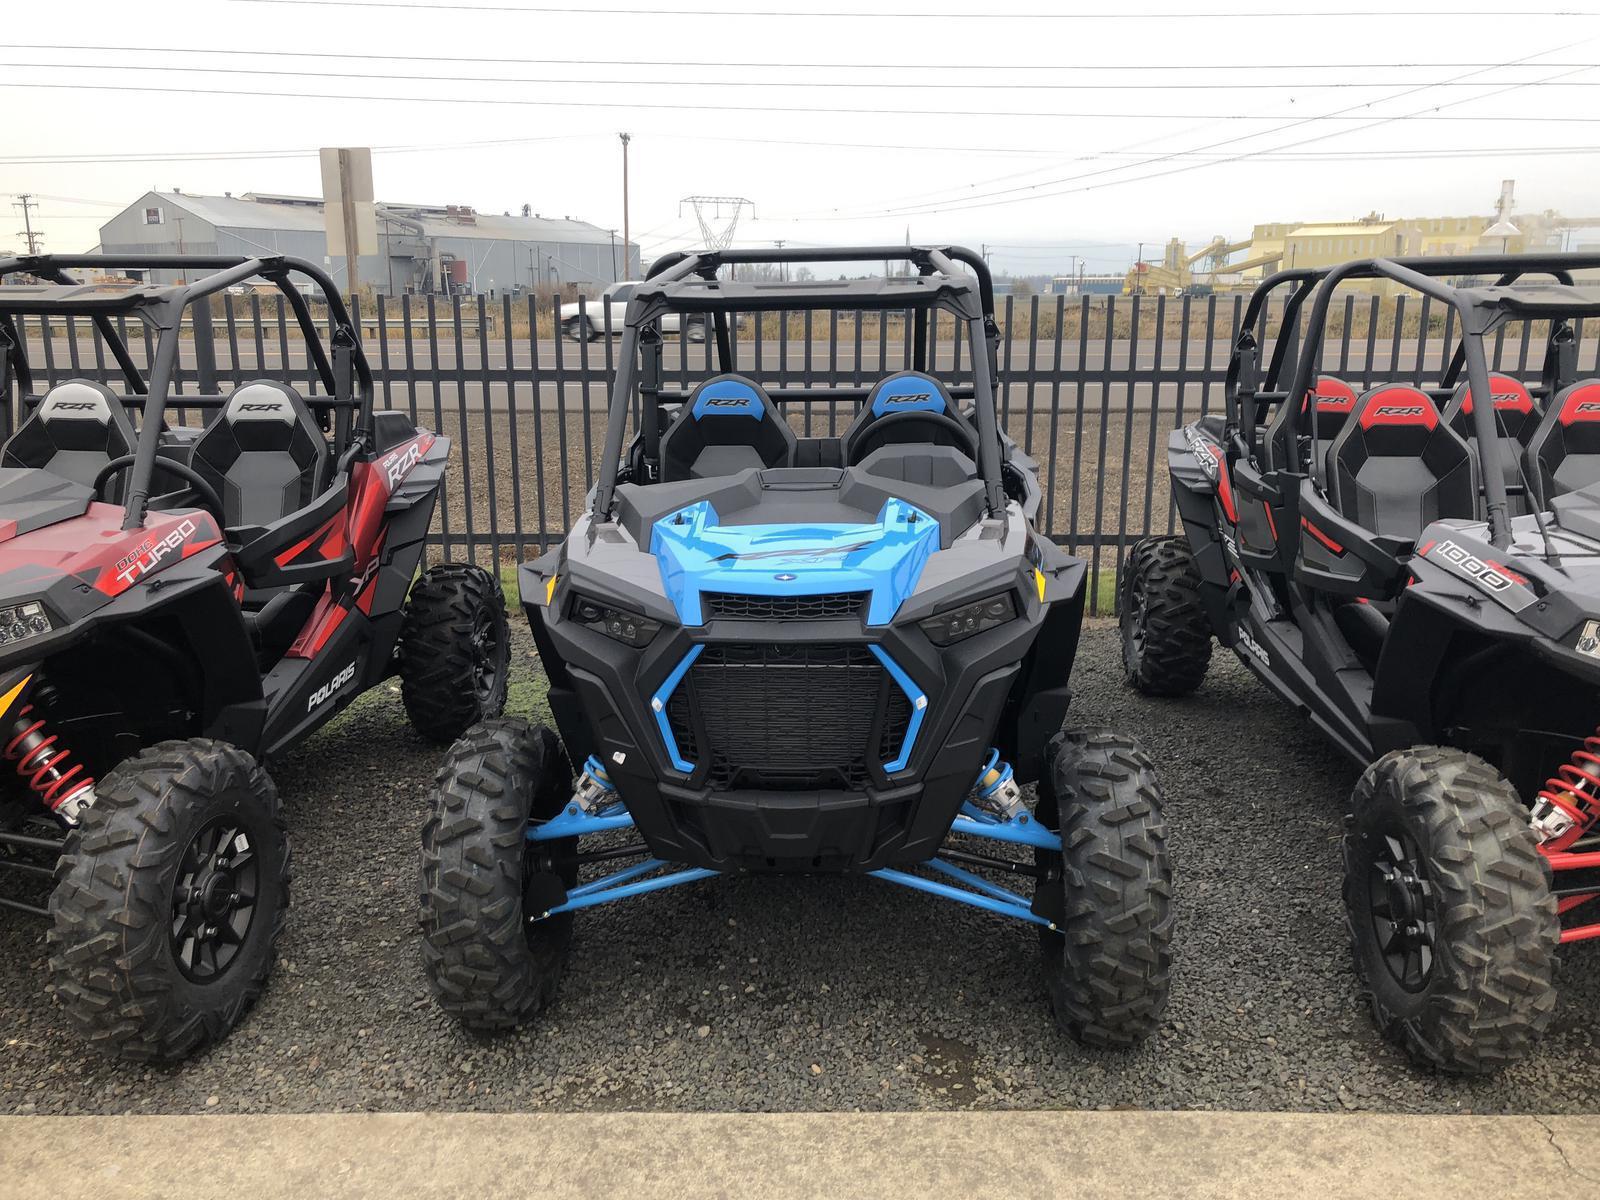 2019 Polaris Industries Rzr Xp Turbo Titanium Metallic For Sale